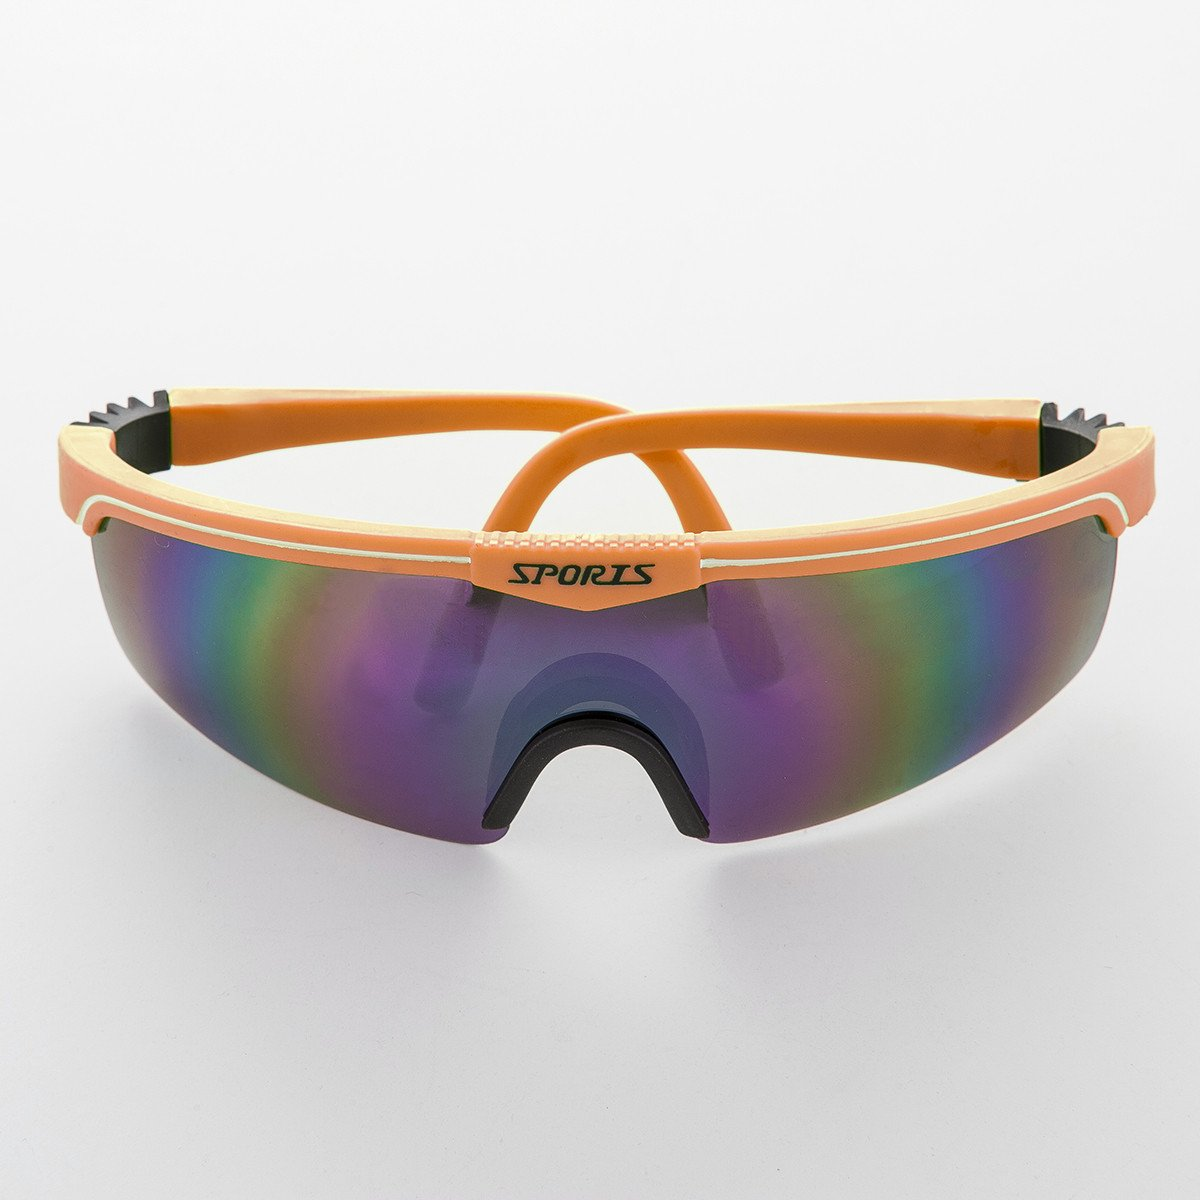 6b0cc91509805 90s Sports Reflective Mirror Shield Lens Vintage Sunglass - Cosmo ...